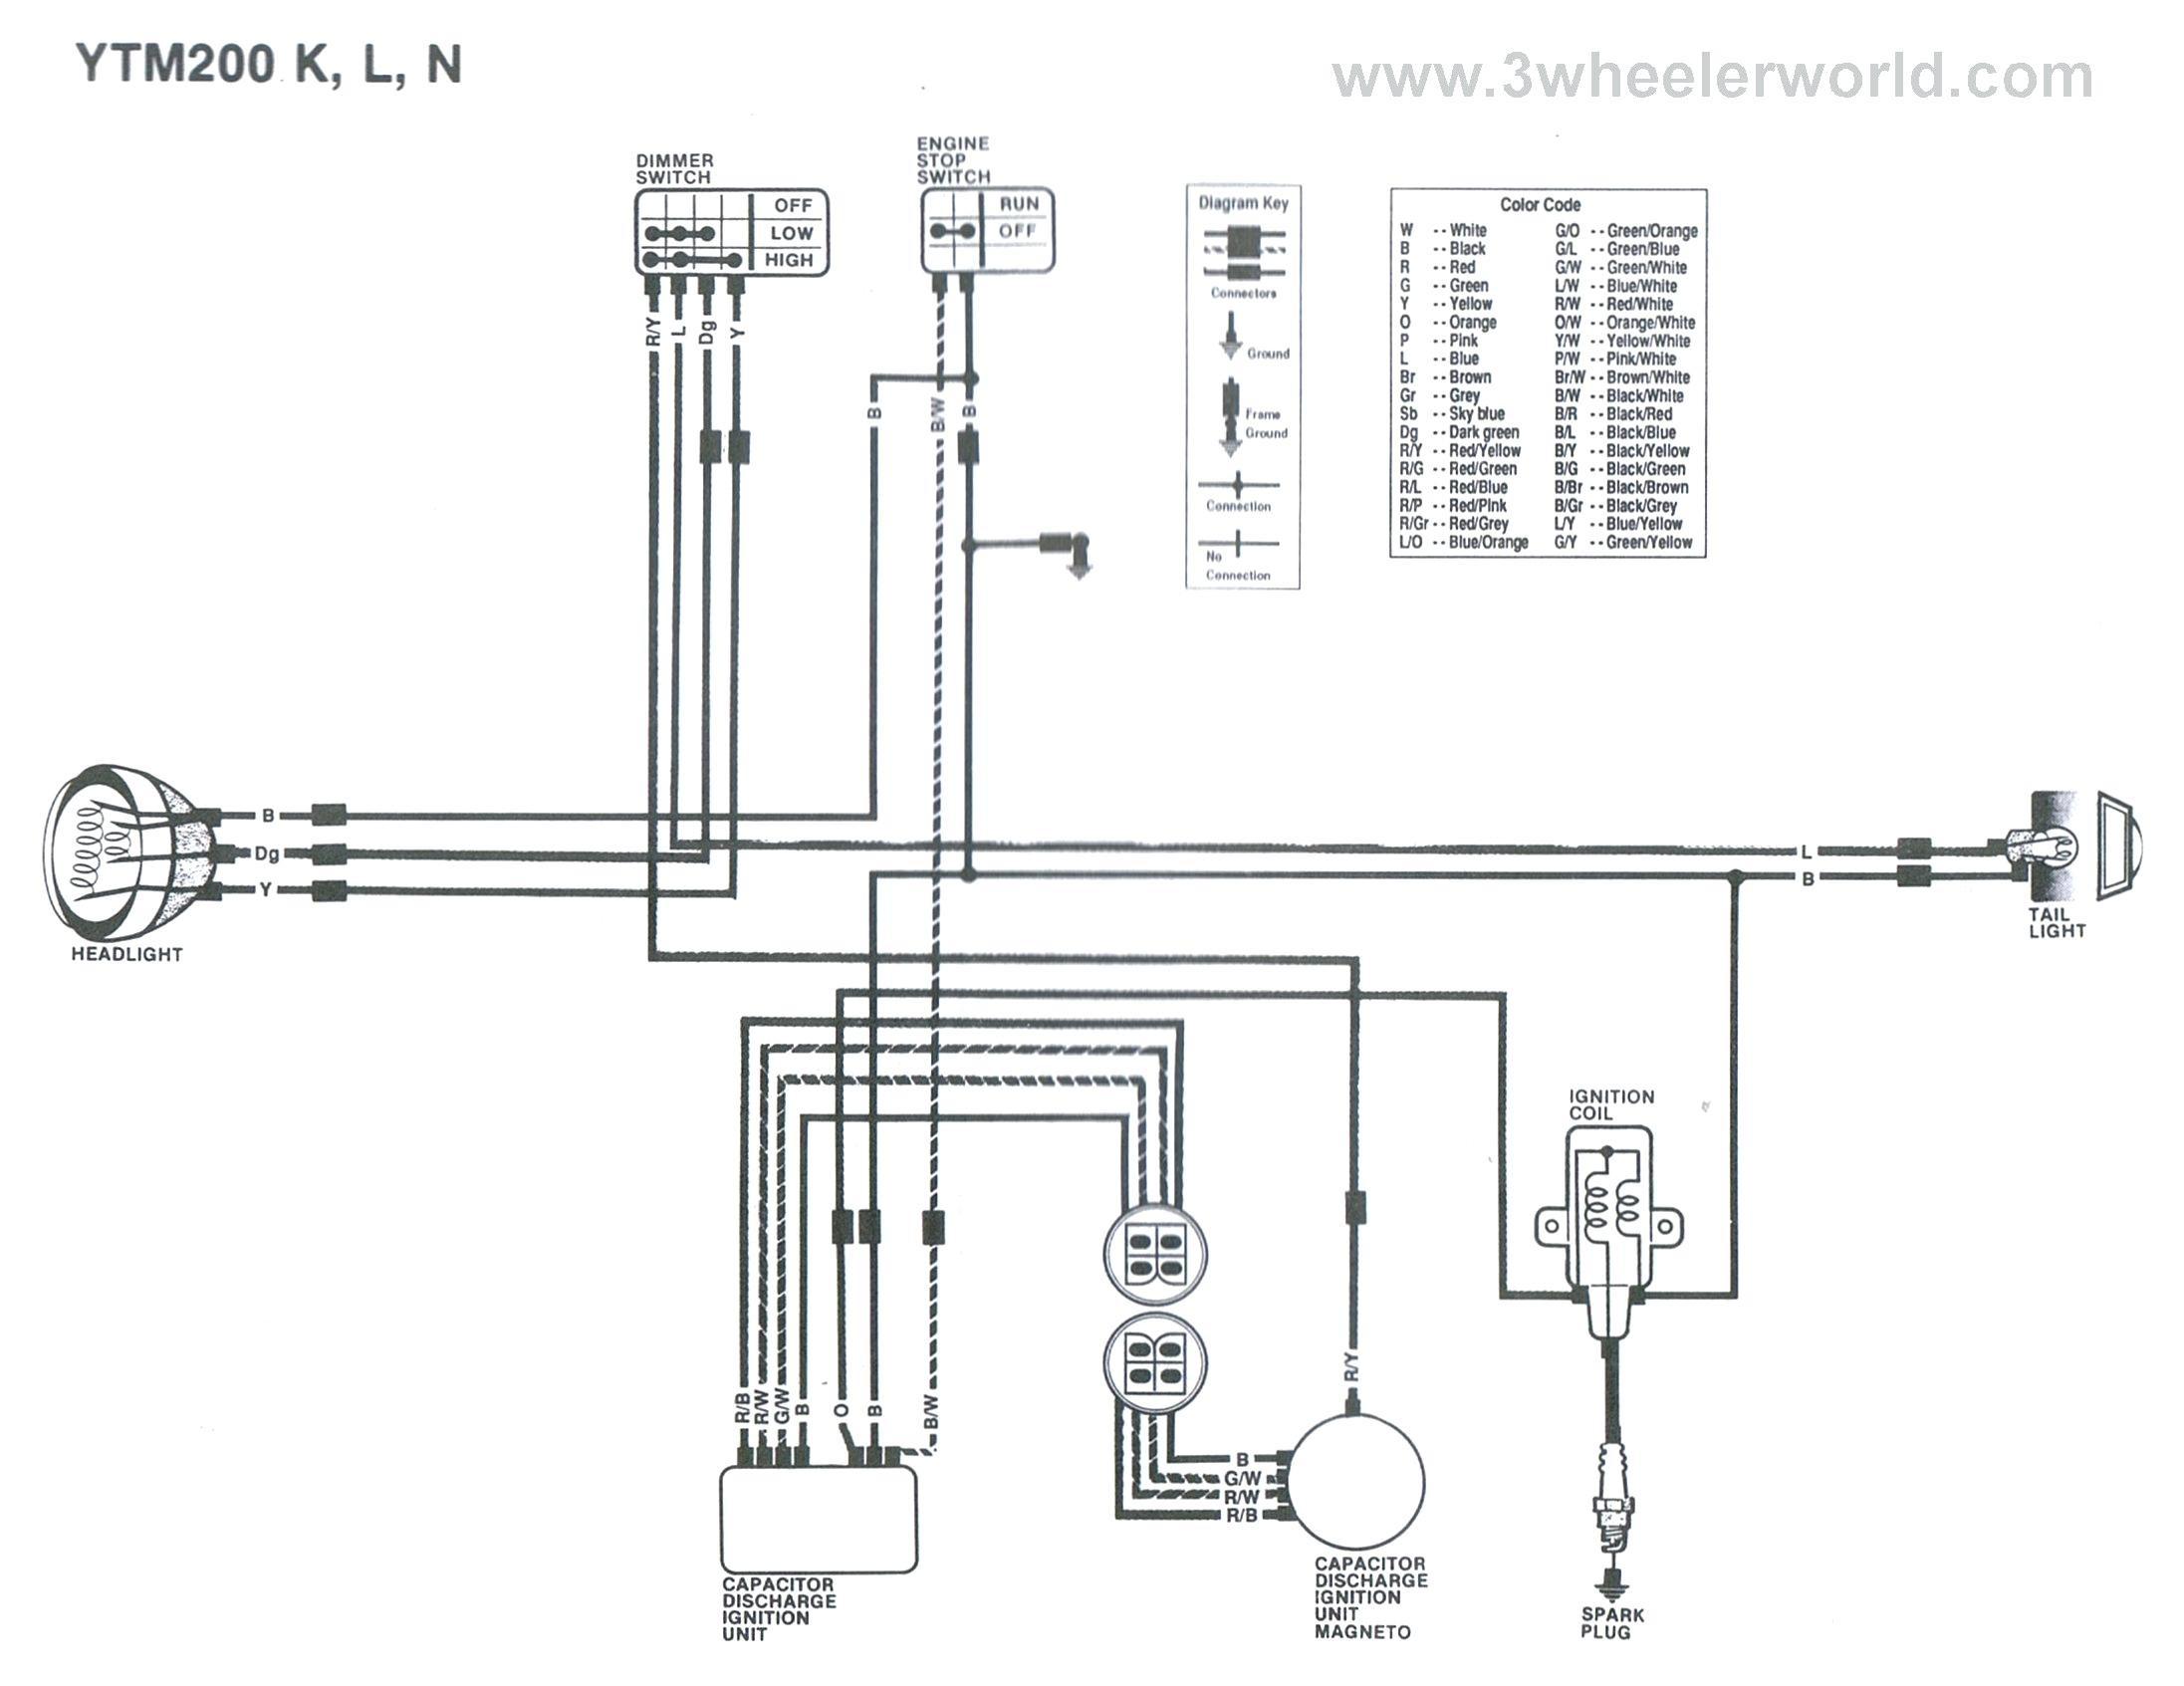 Yamaha Yfz 450 Wiring Diagram Best Yfz 450 Wiring Harness Diagram Awesome Blaster s Electrical